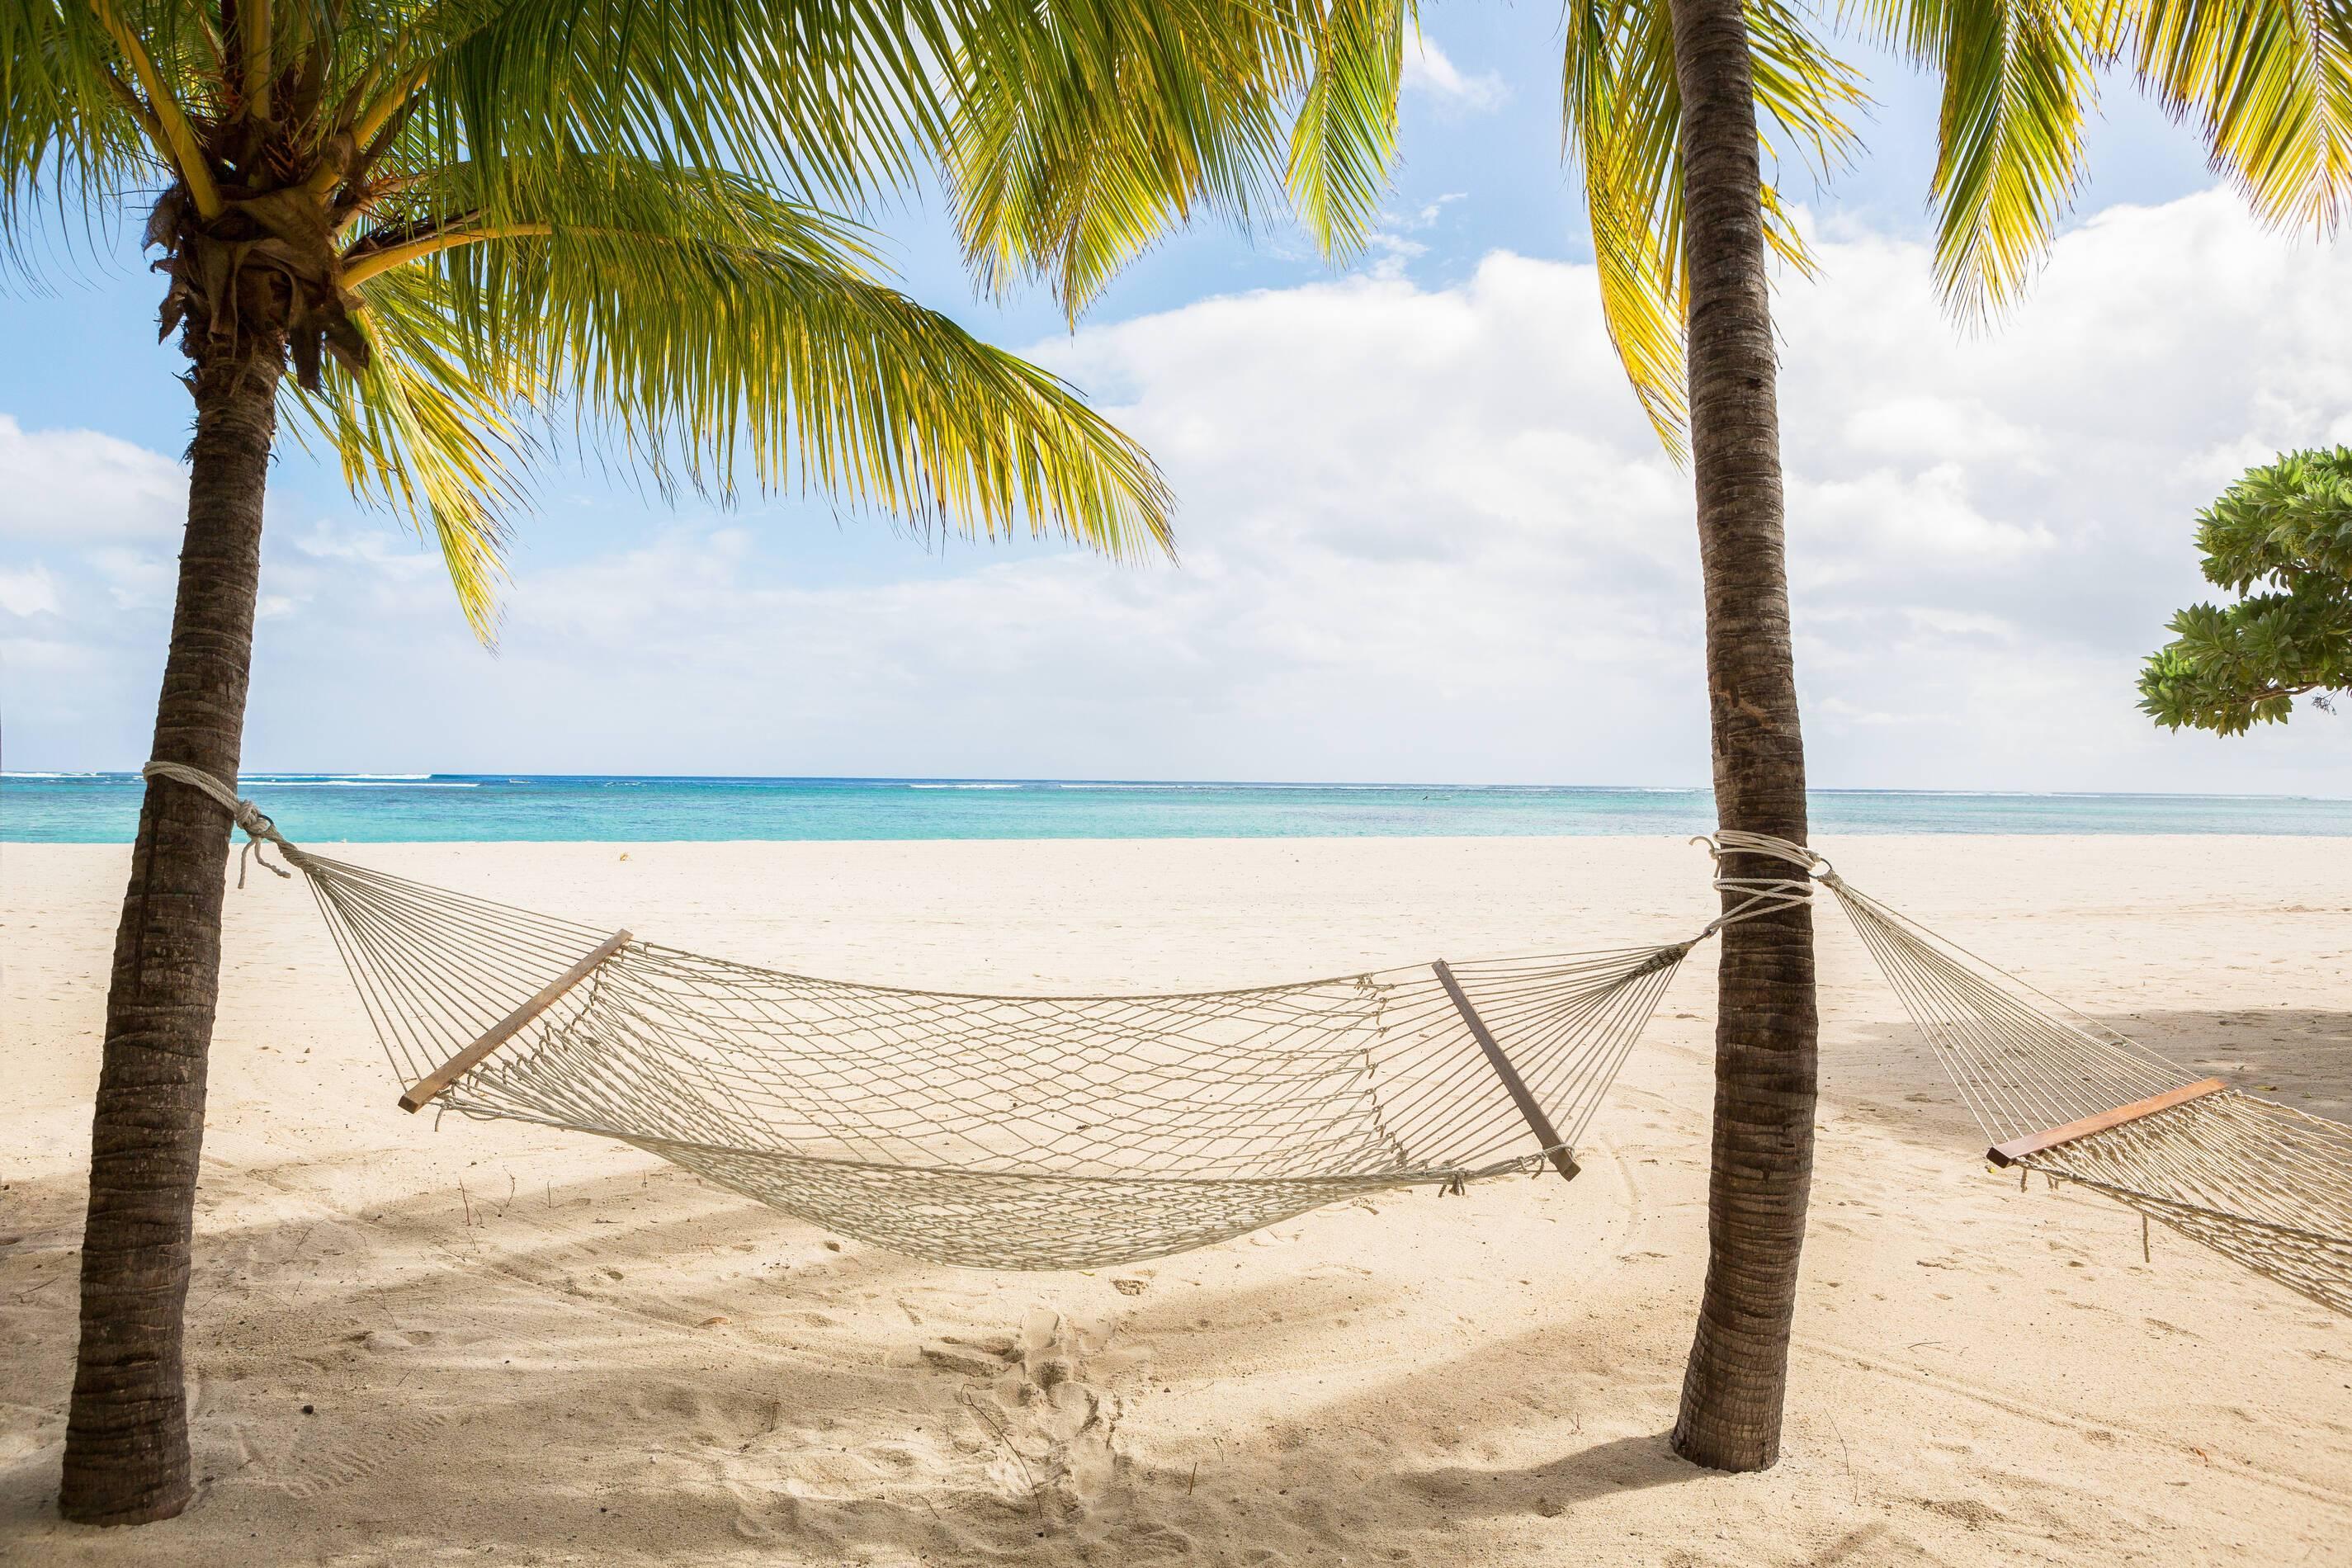 Dinarobin Beachcomber Plage Maurice New Mauritius Hotels